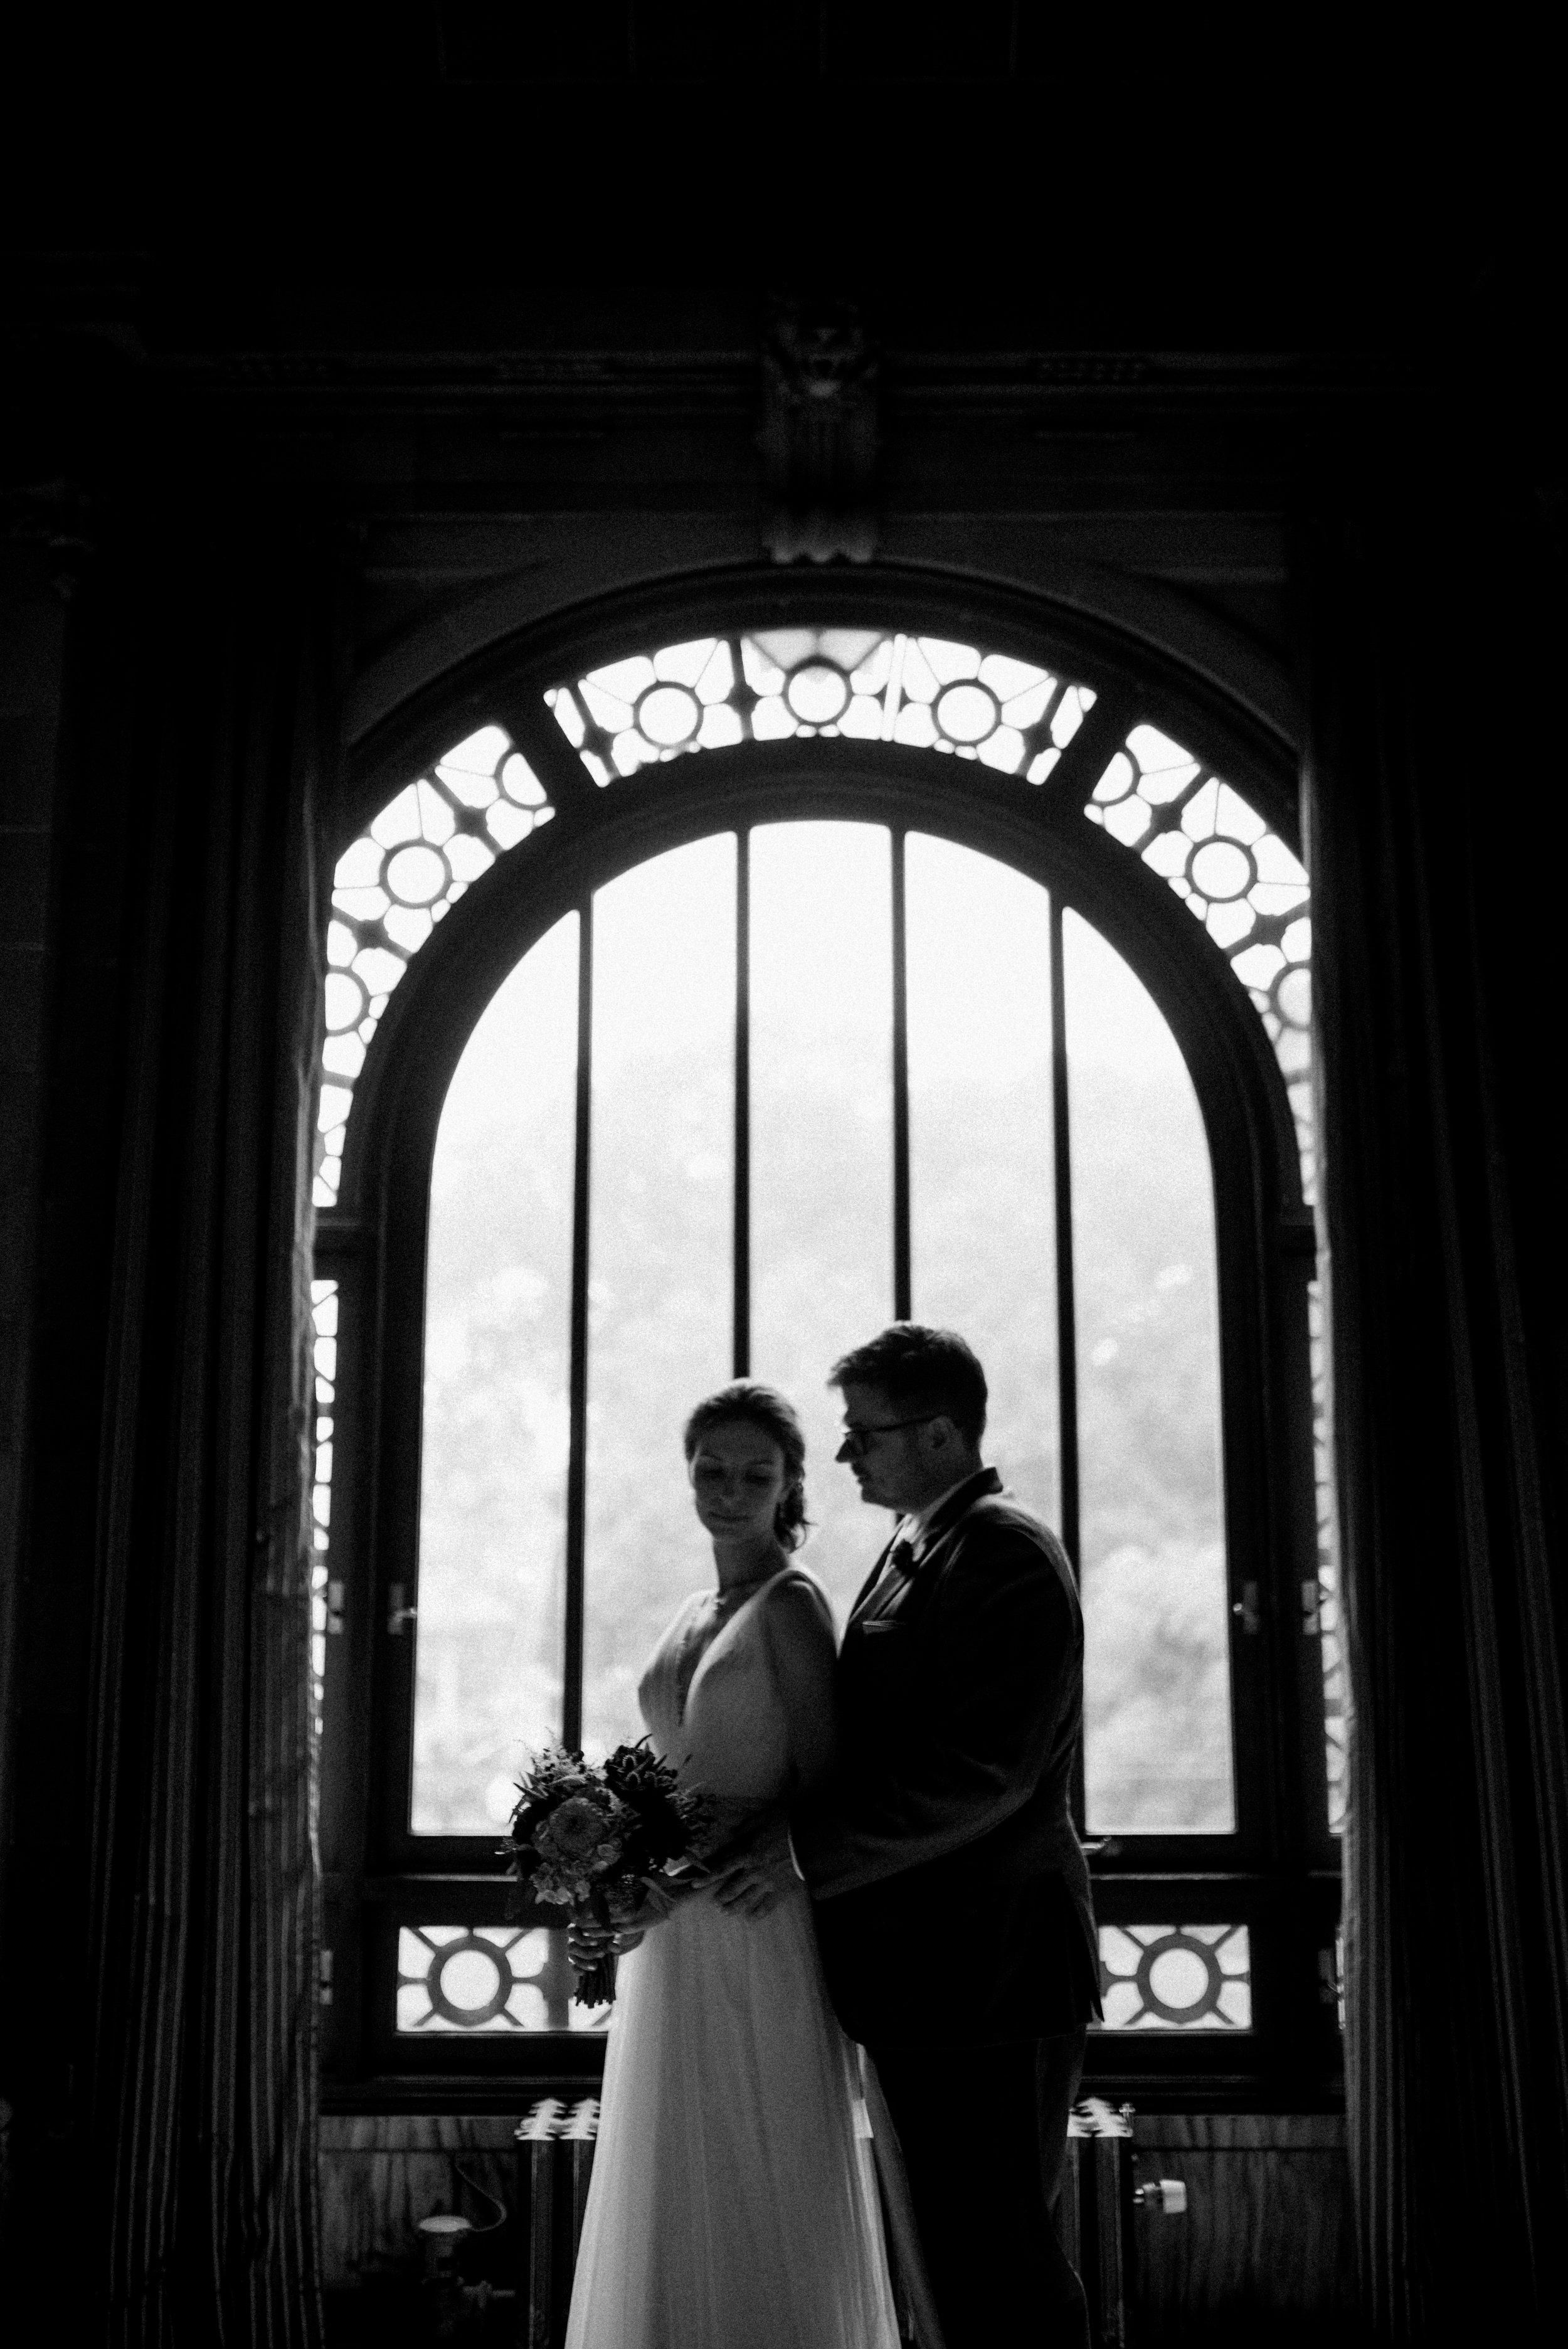 cincinnati-wedding-photographer-chelsea-hall-photography-memorial-hall-16.jpg